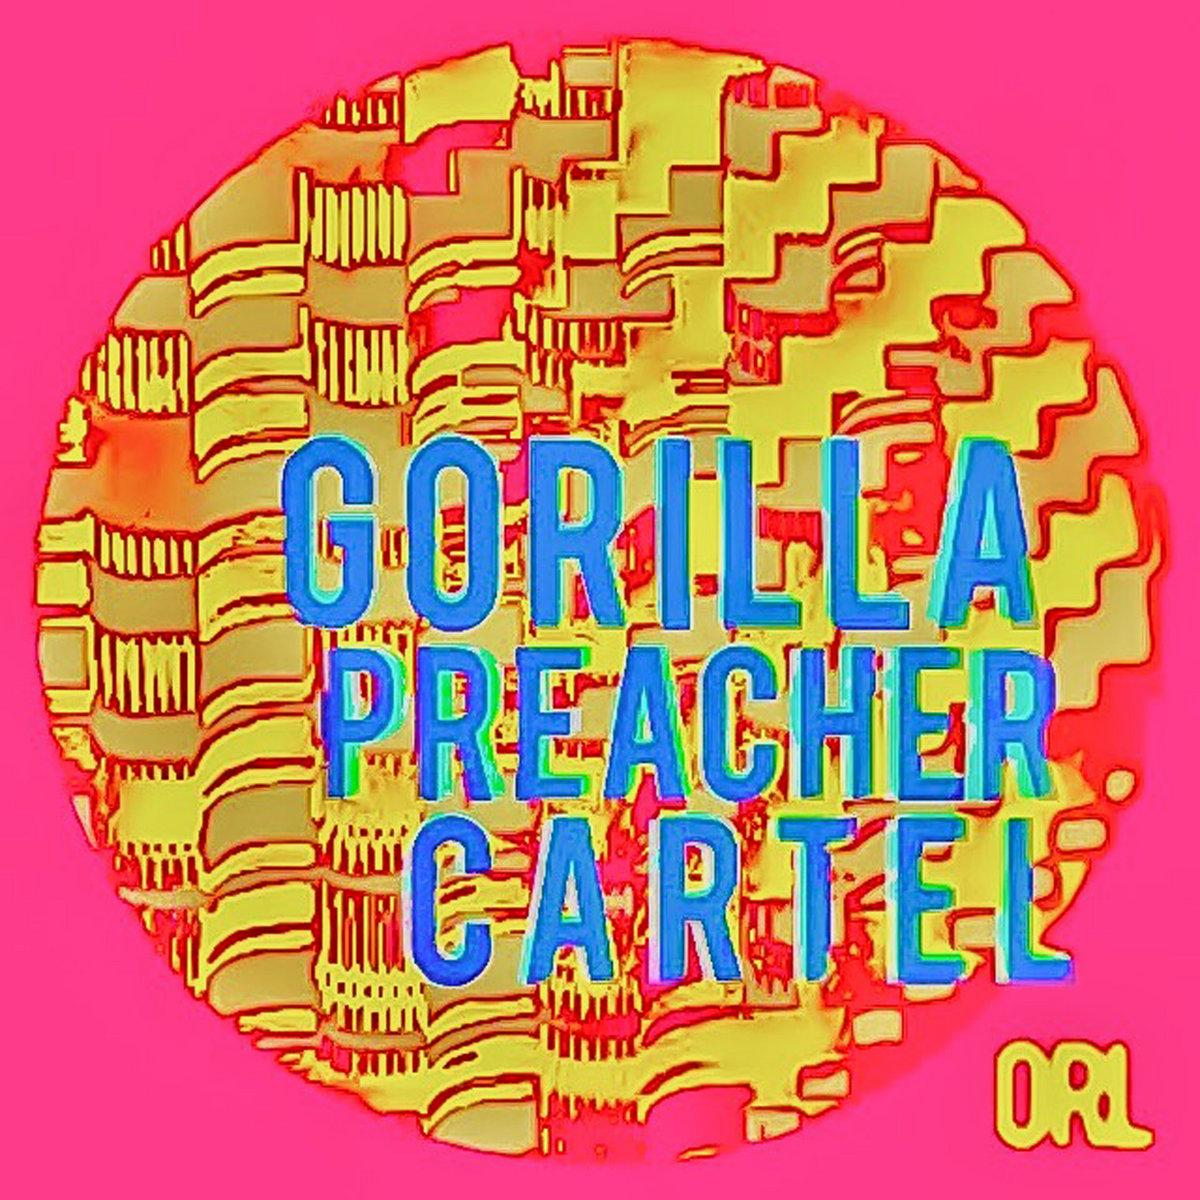 Gorilla Preacher Cartel: Album Cover